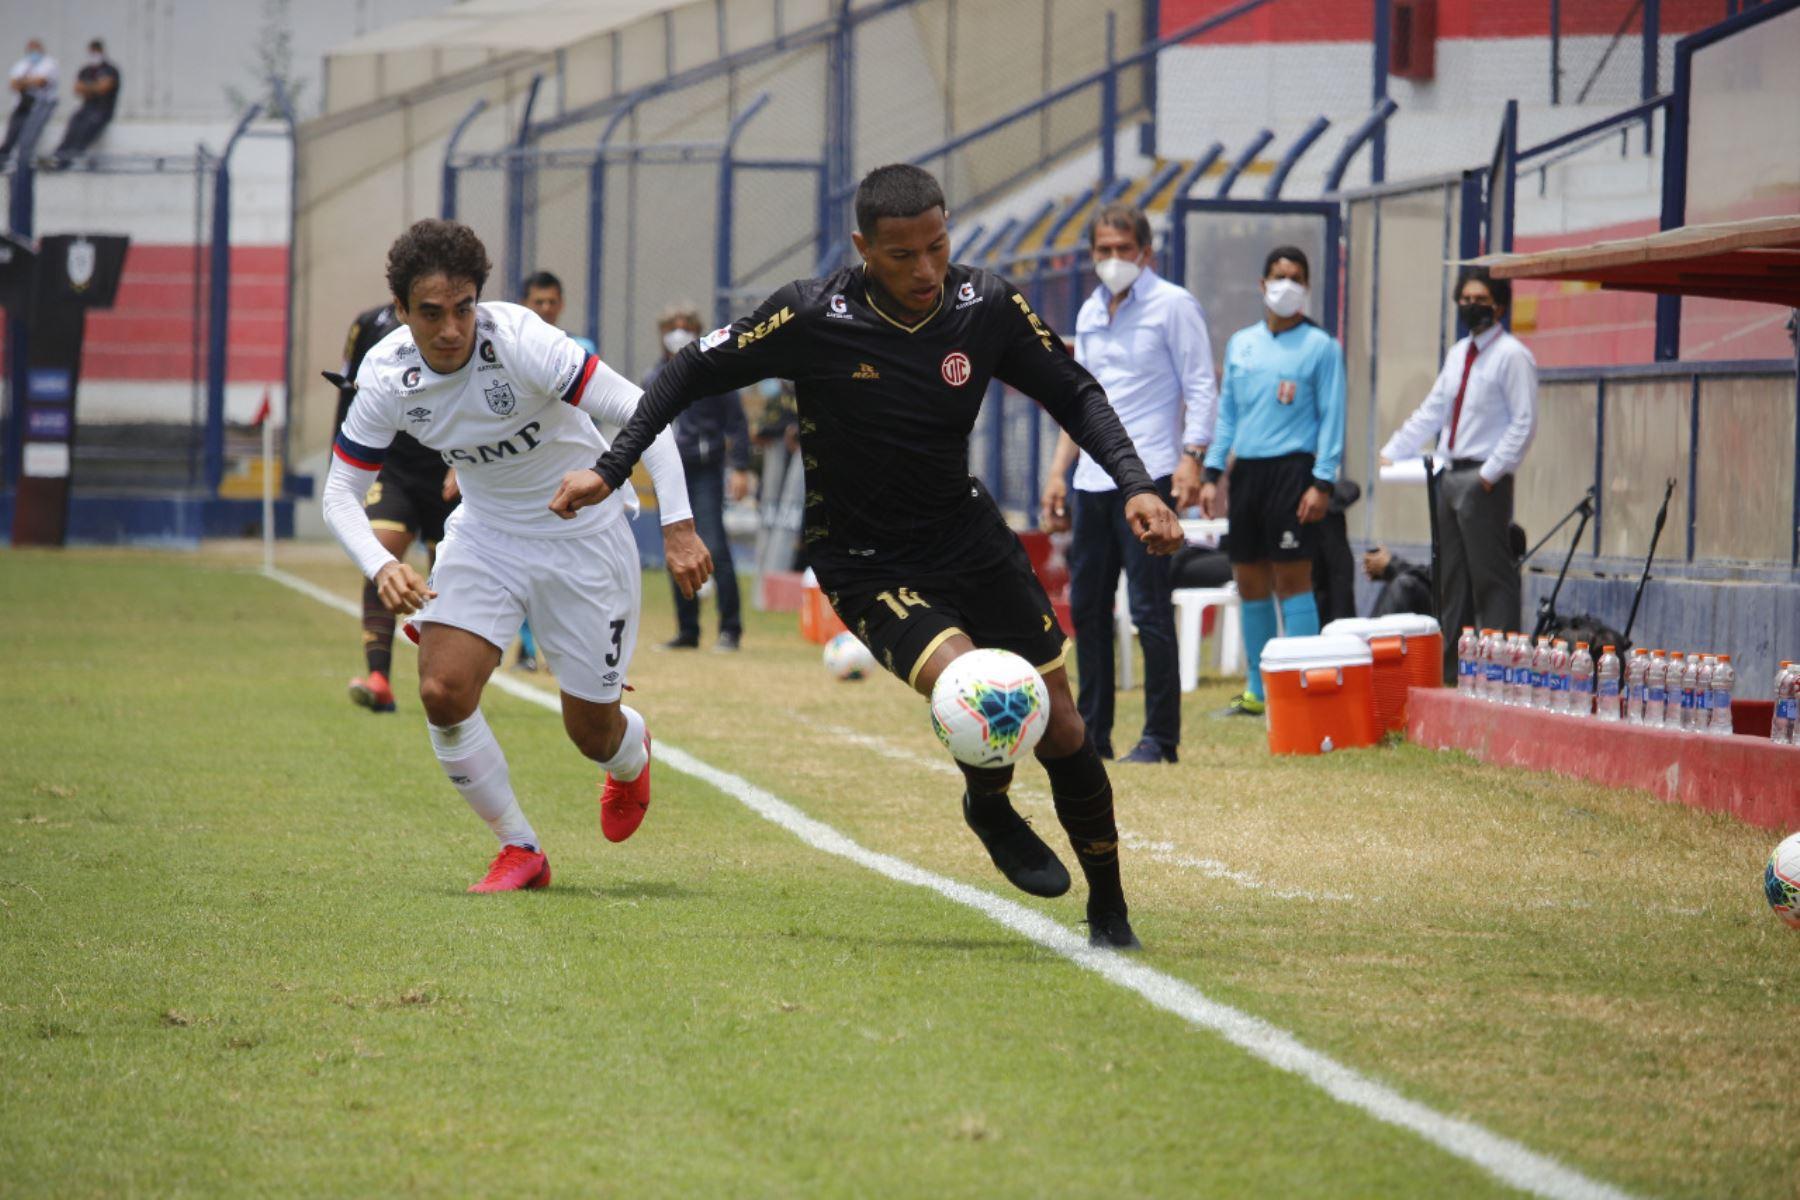 El futbolista E. Oliva del Club UTC se enfrenta a C. Vaásquez de la Universidad San Martín por la jornada 13 de la Liga 1, en el estadio Iván Elías Moreno. Foto: @LigaFutProf